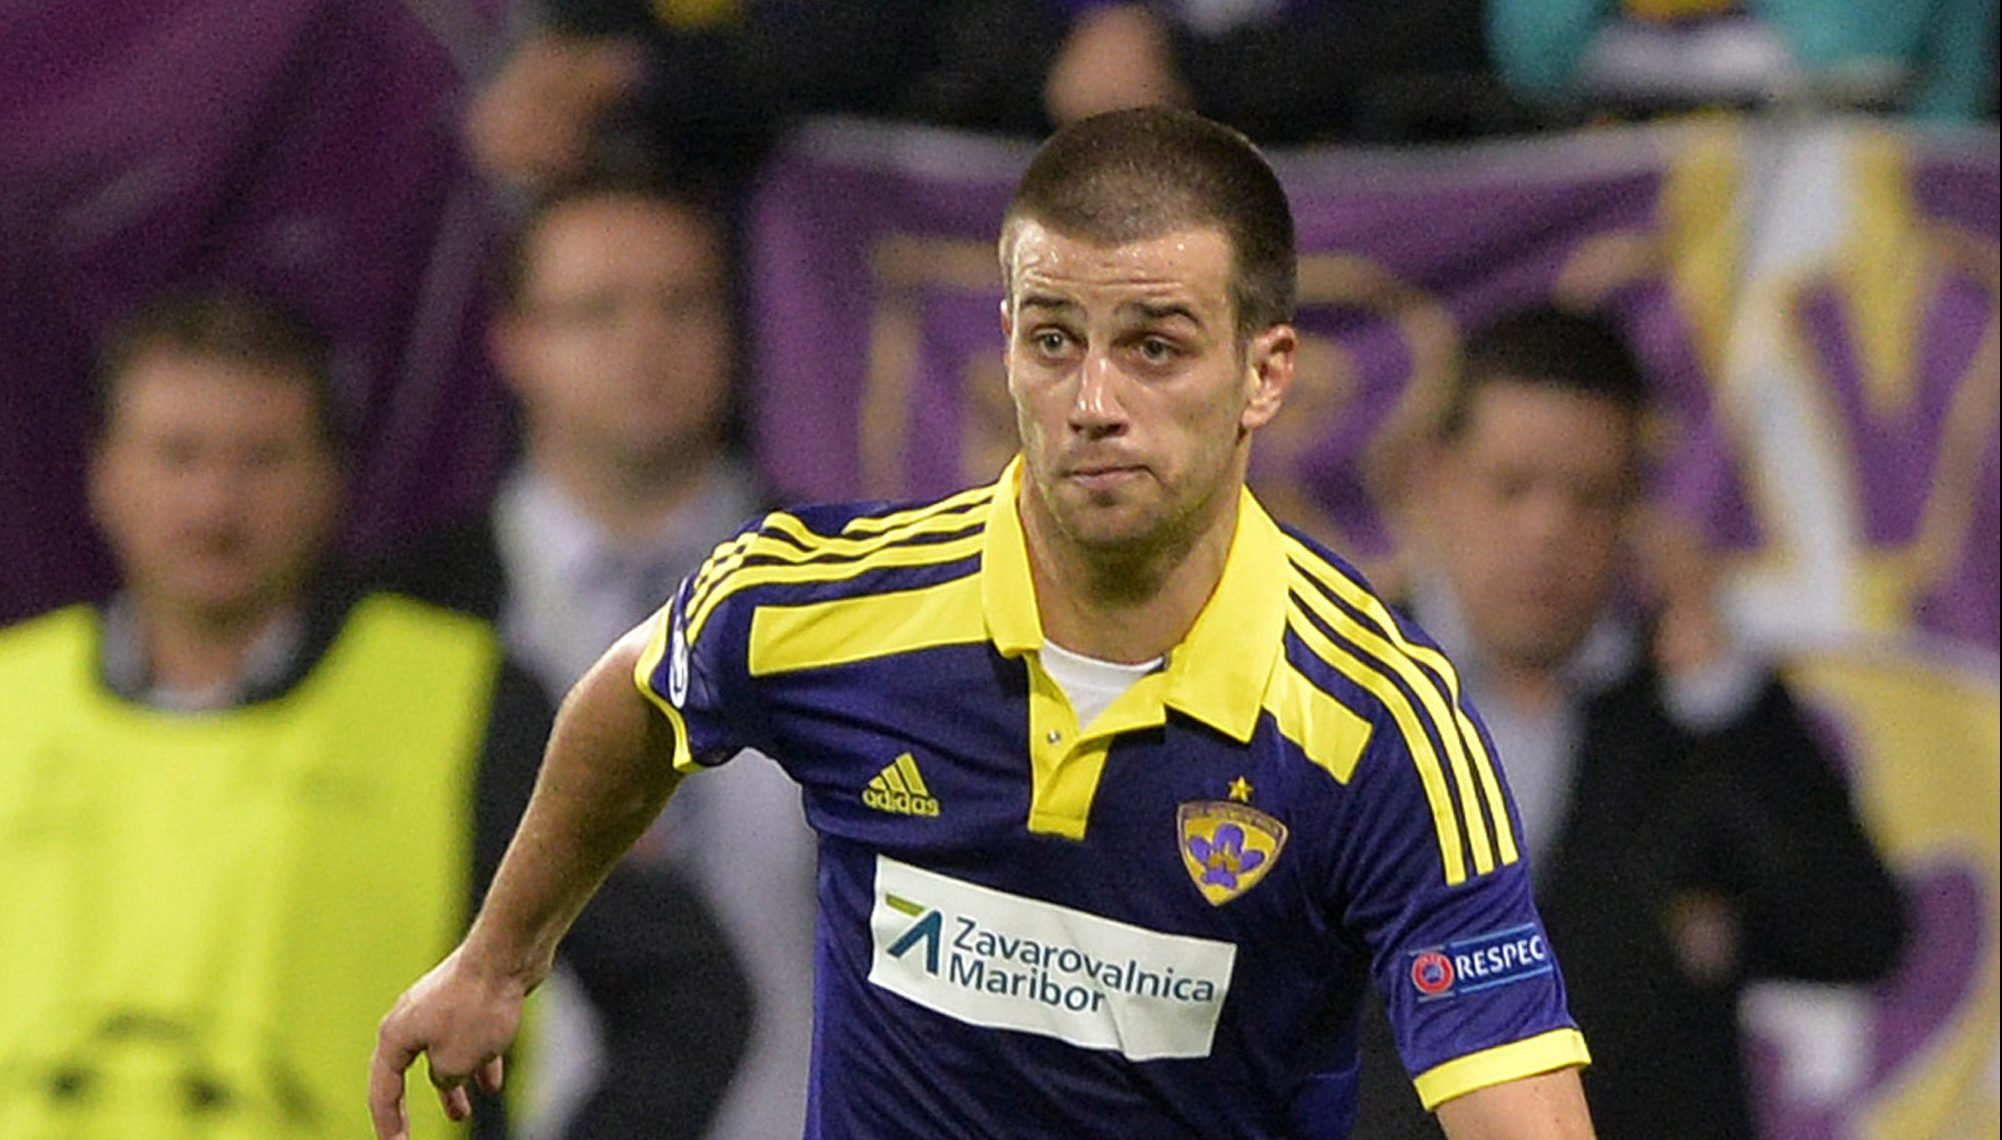 MK Maribor defender Mitja Viler feels they are favourites.